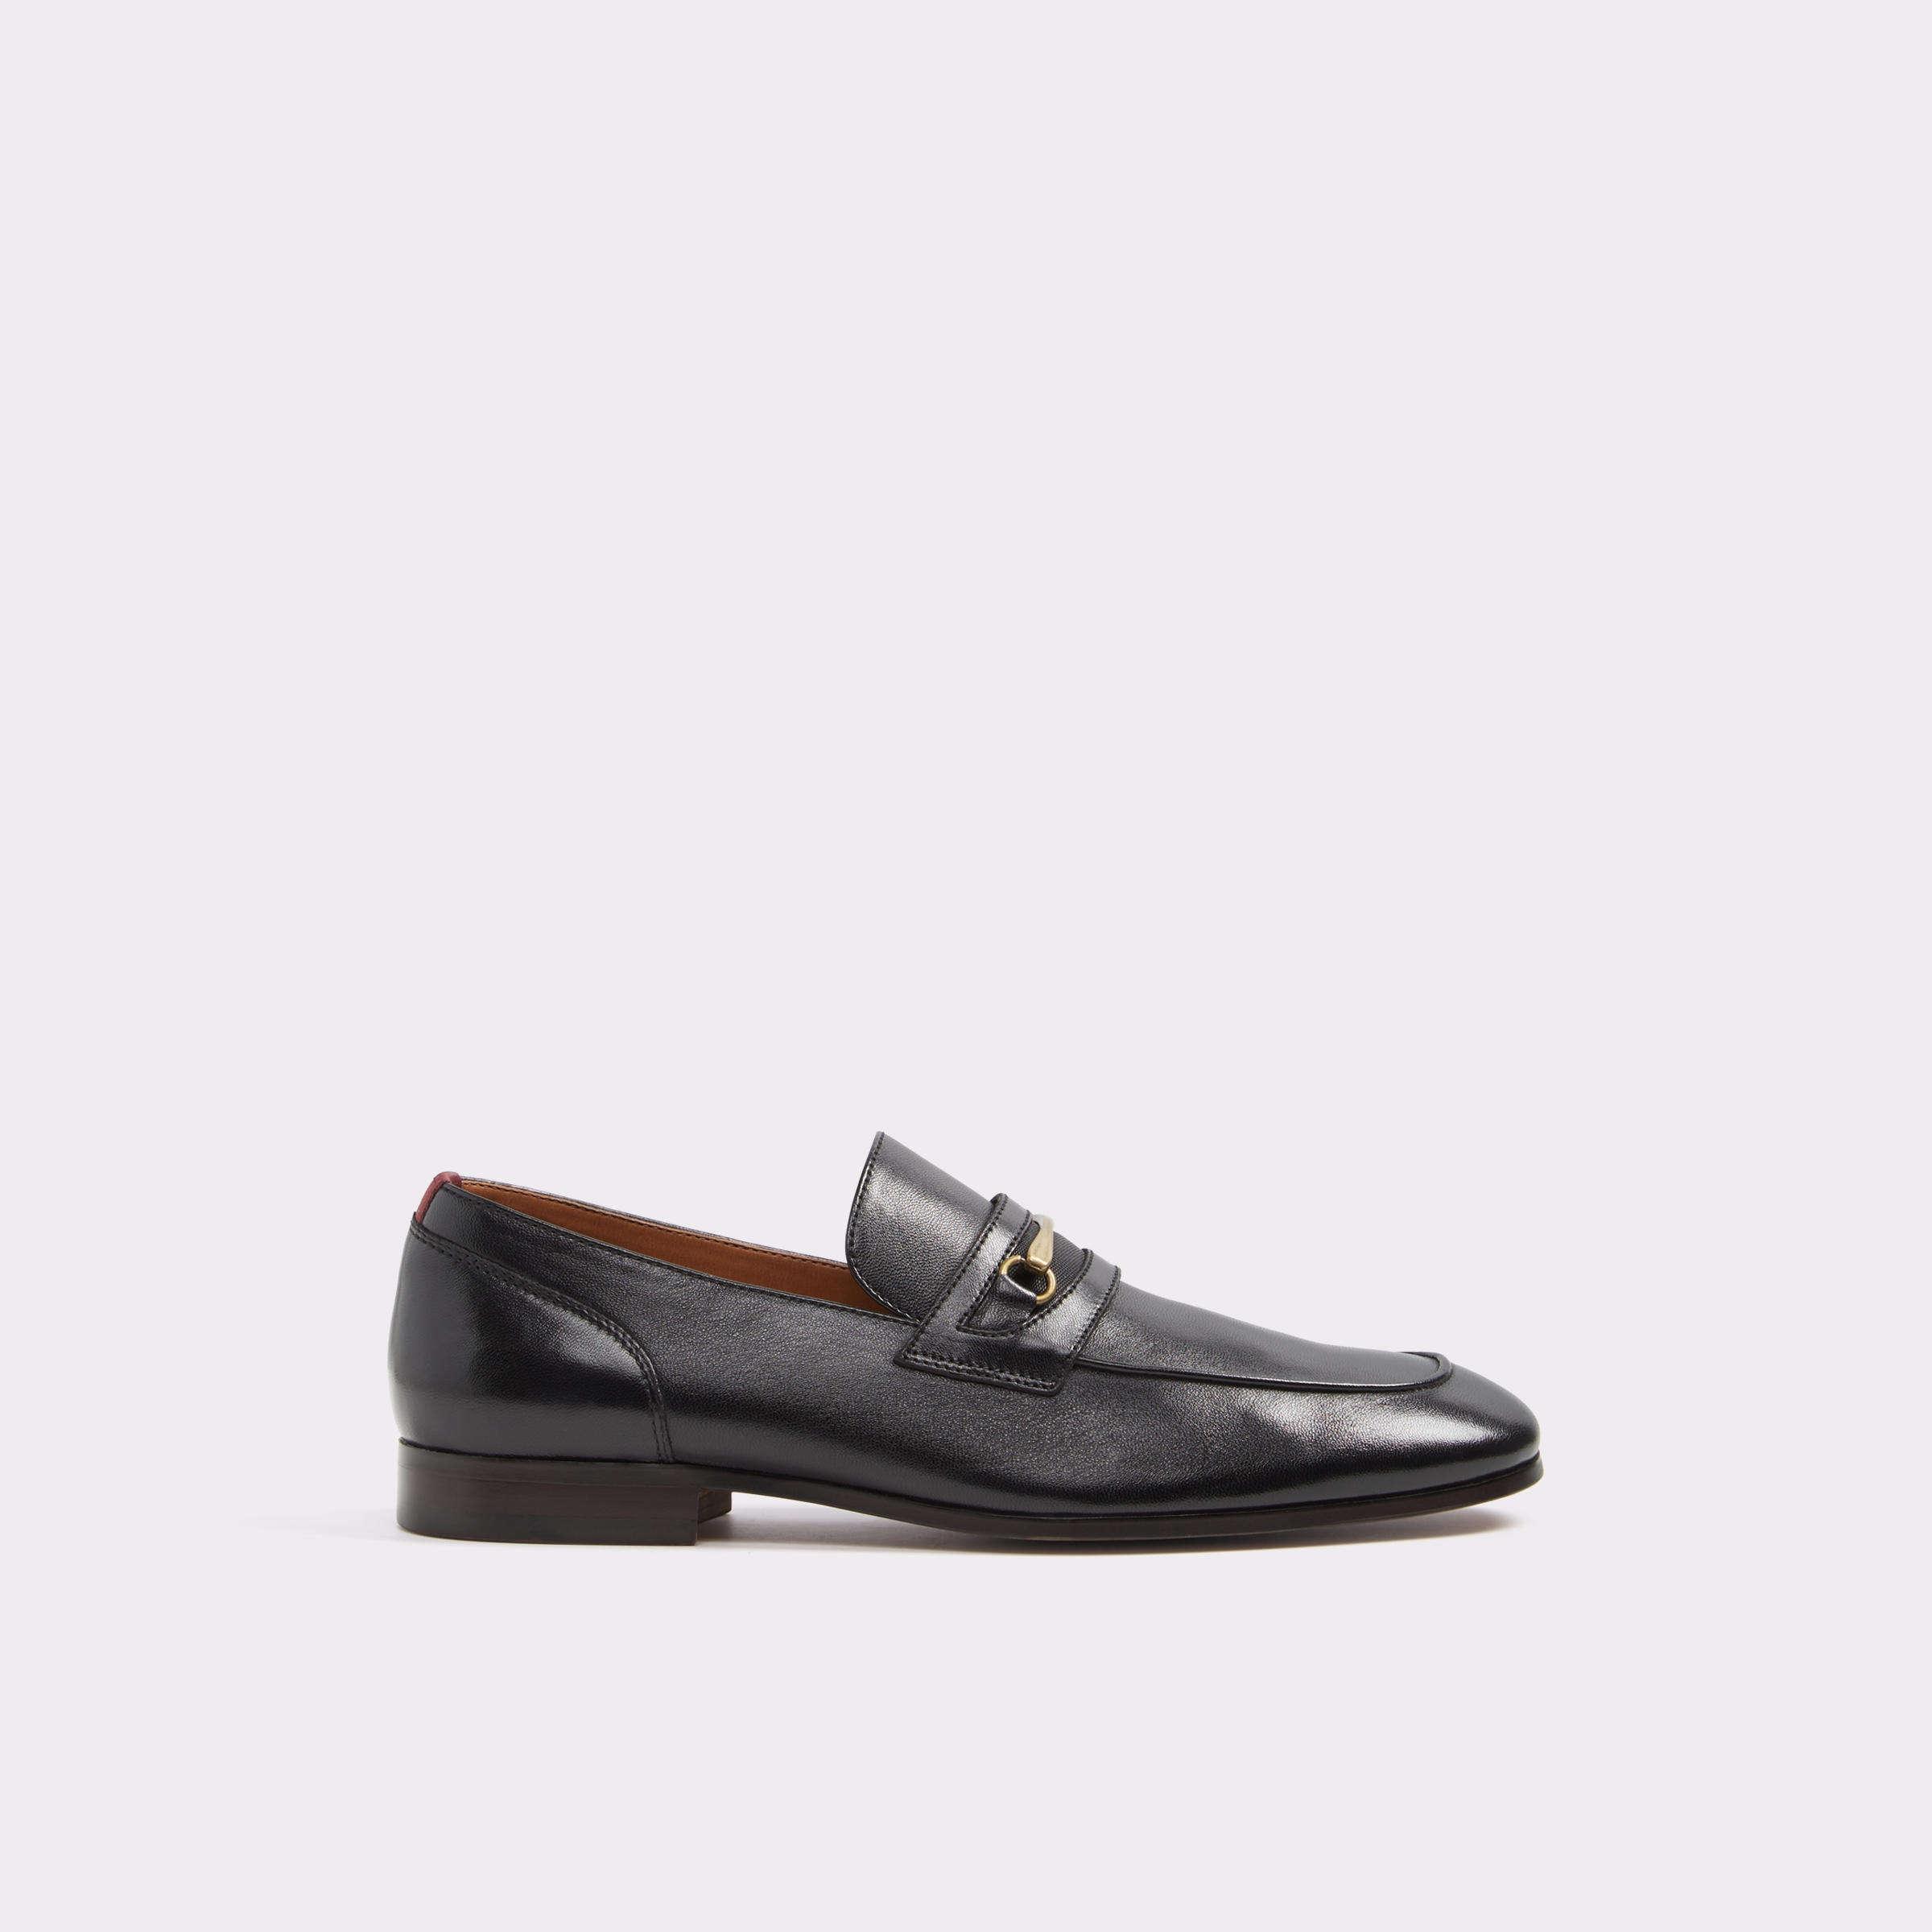 Pantofi eleganti negri, pentru barbati, ALDO - Murat97, din piele naturala